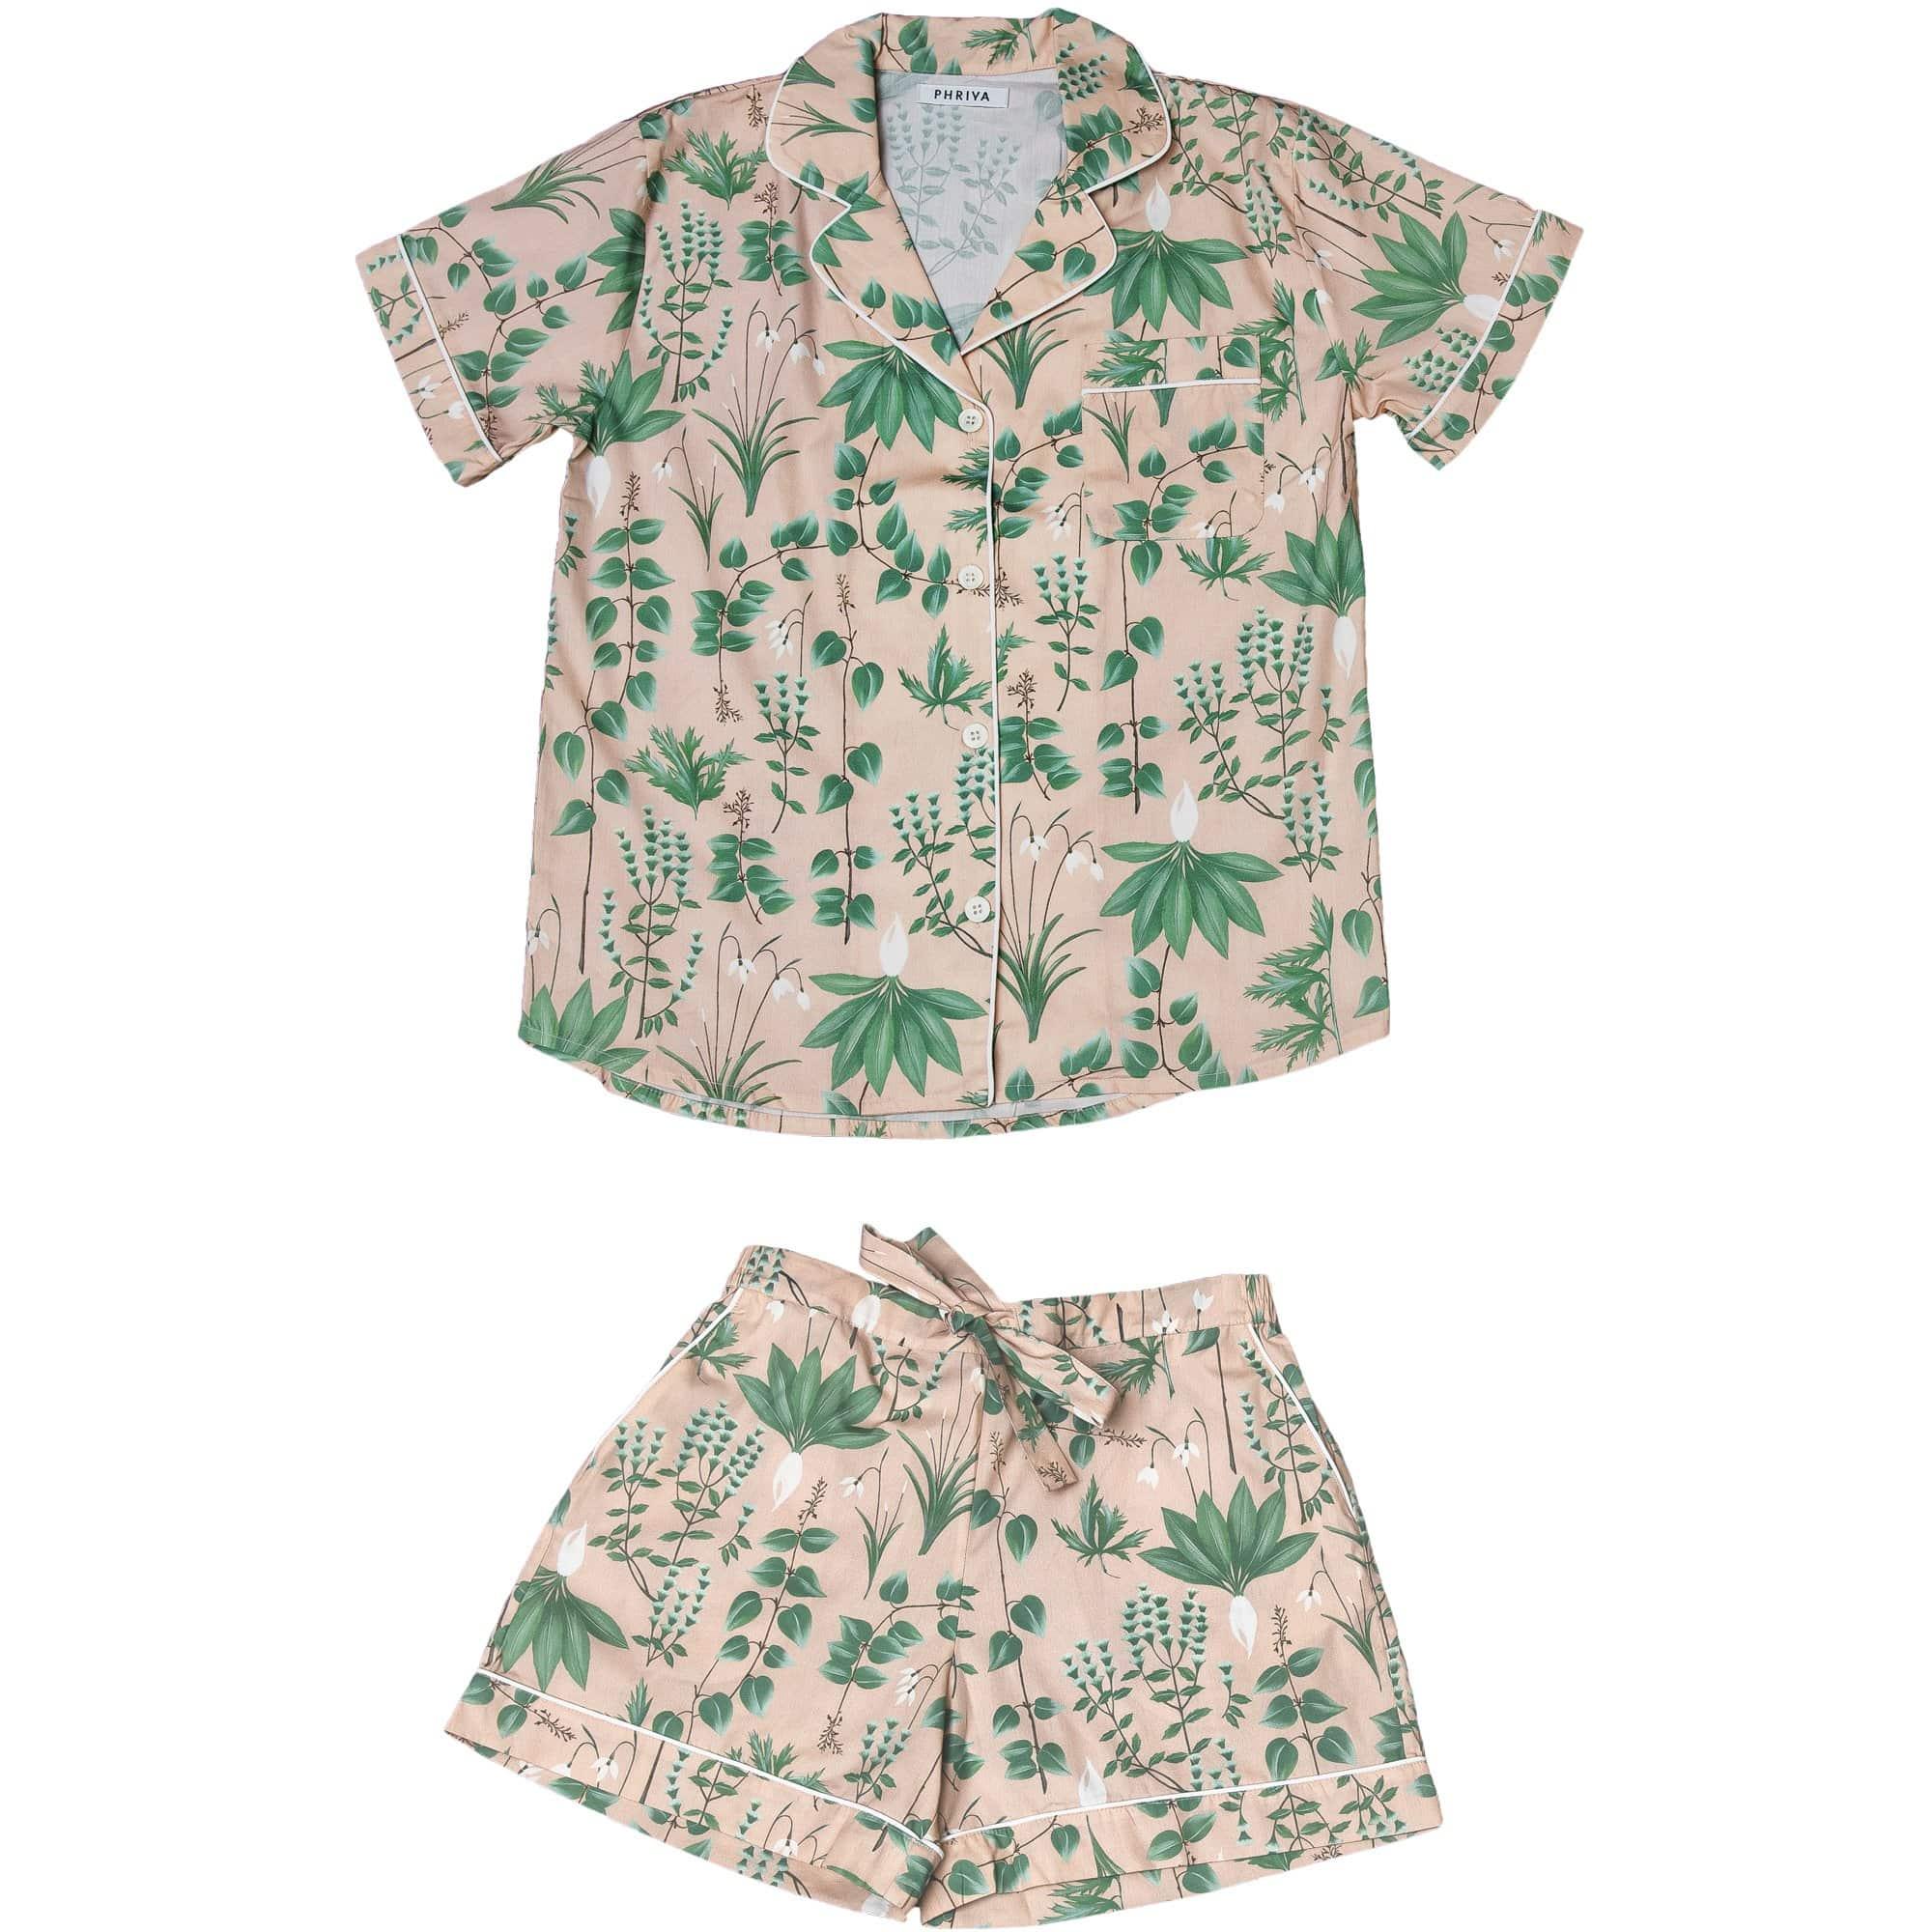 Phriya Women's Pink Circe's Garden Short Pajama Set  - multicolor - Size: One Size